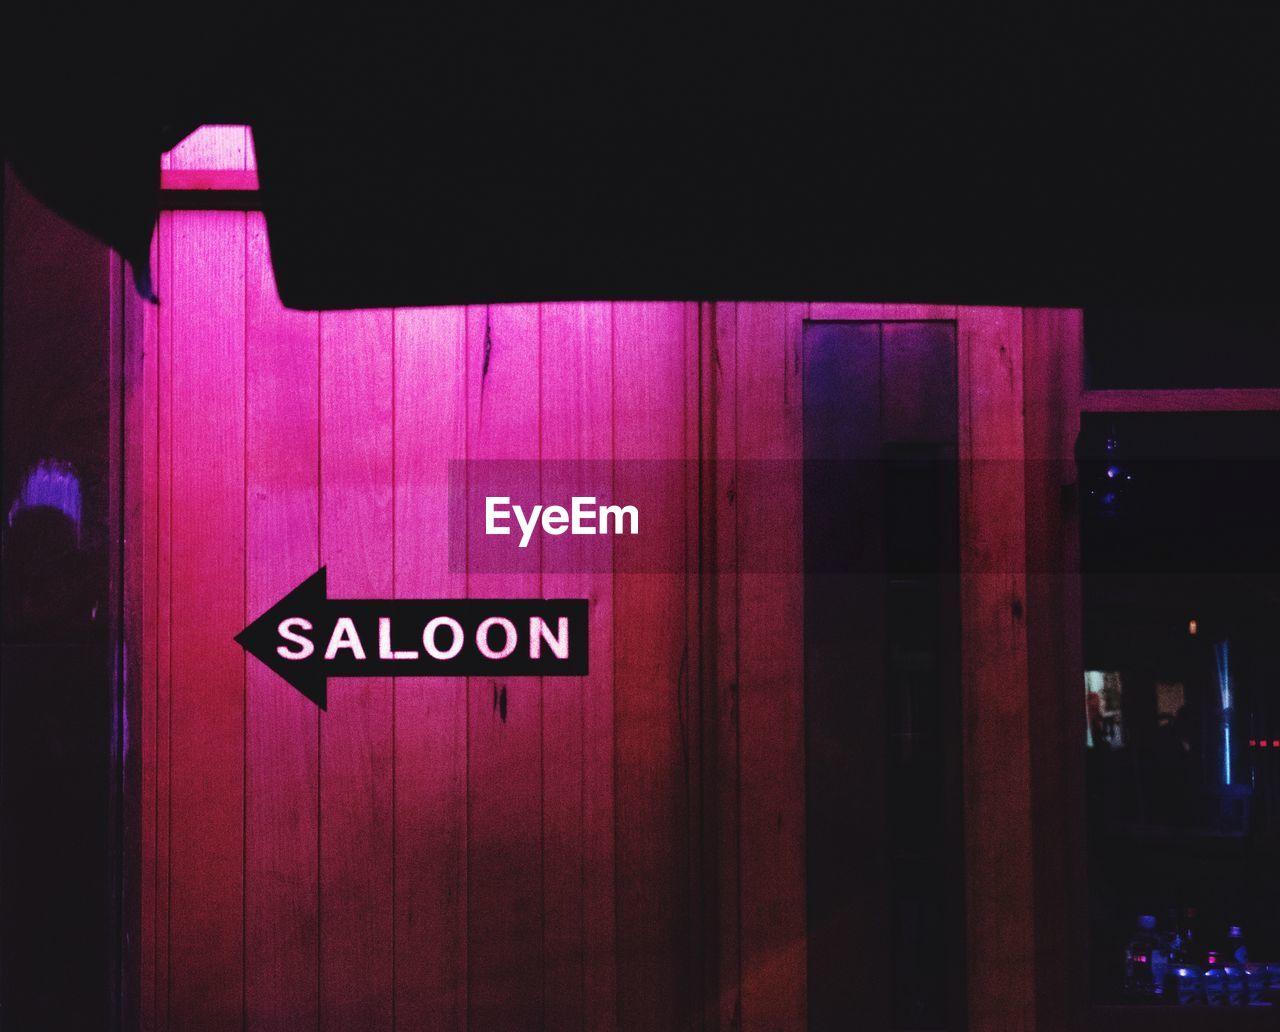 text, western script, communication, no people, illuminated, indoors, night, close-up